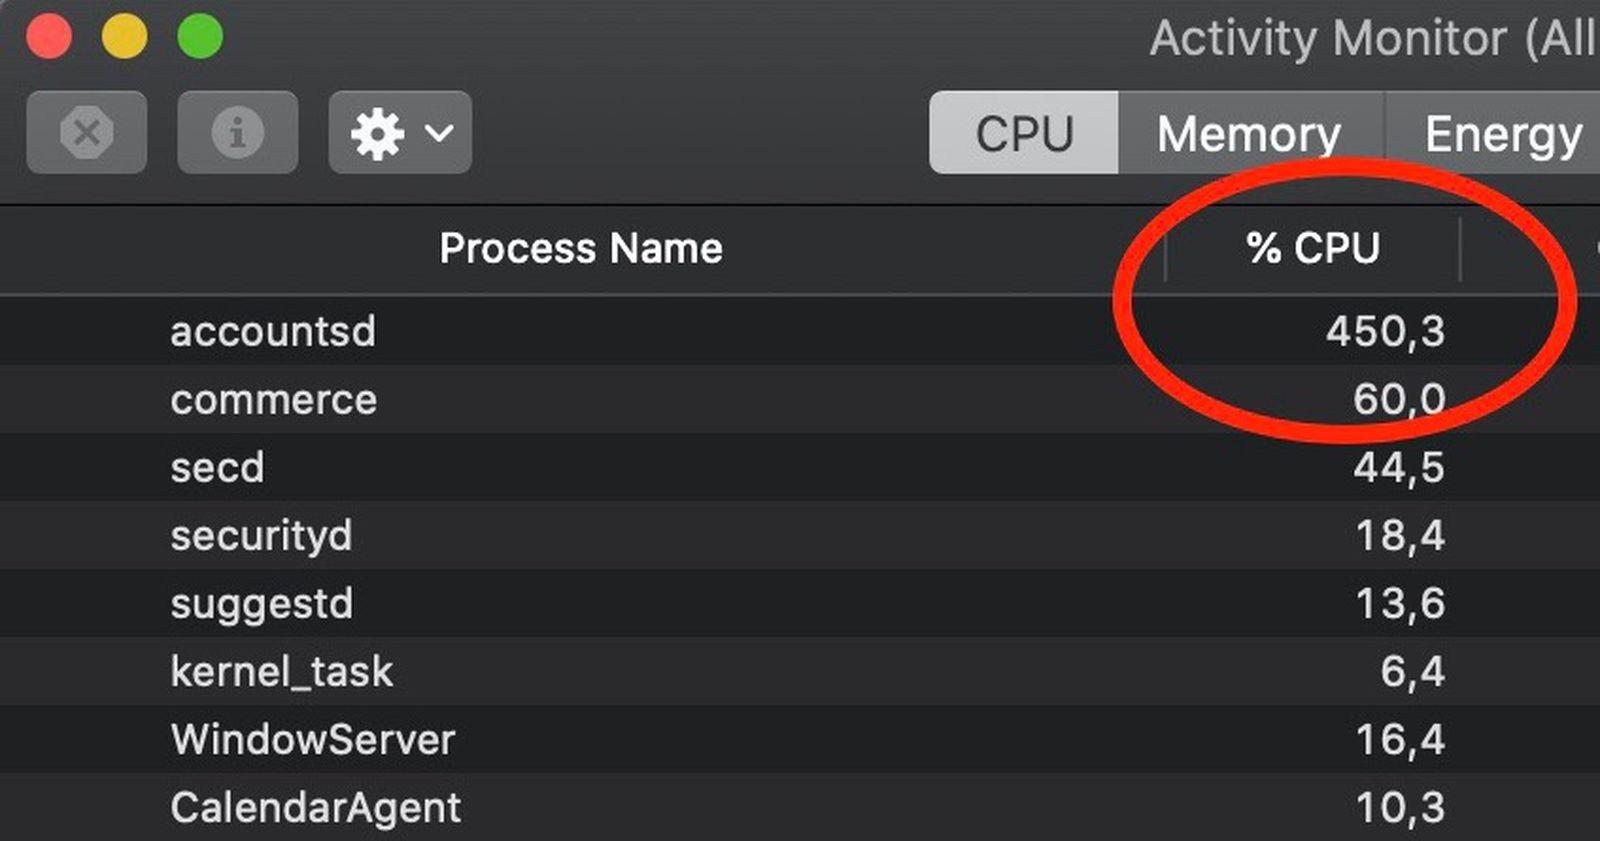 Accountsd: How to Fix High CPU Usage on Mac? 3 Possible Fix TechRechard